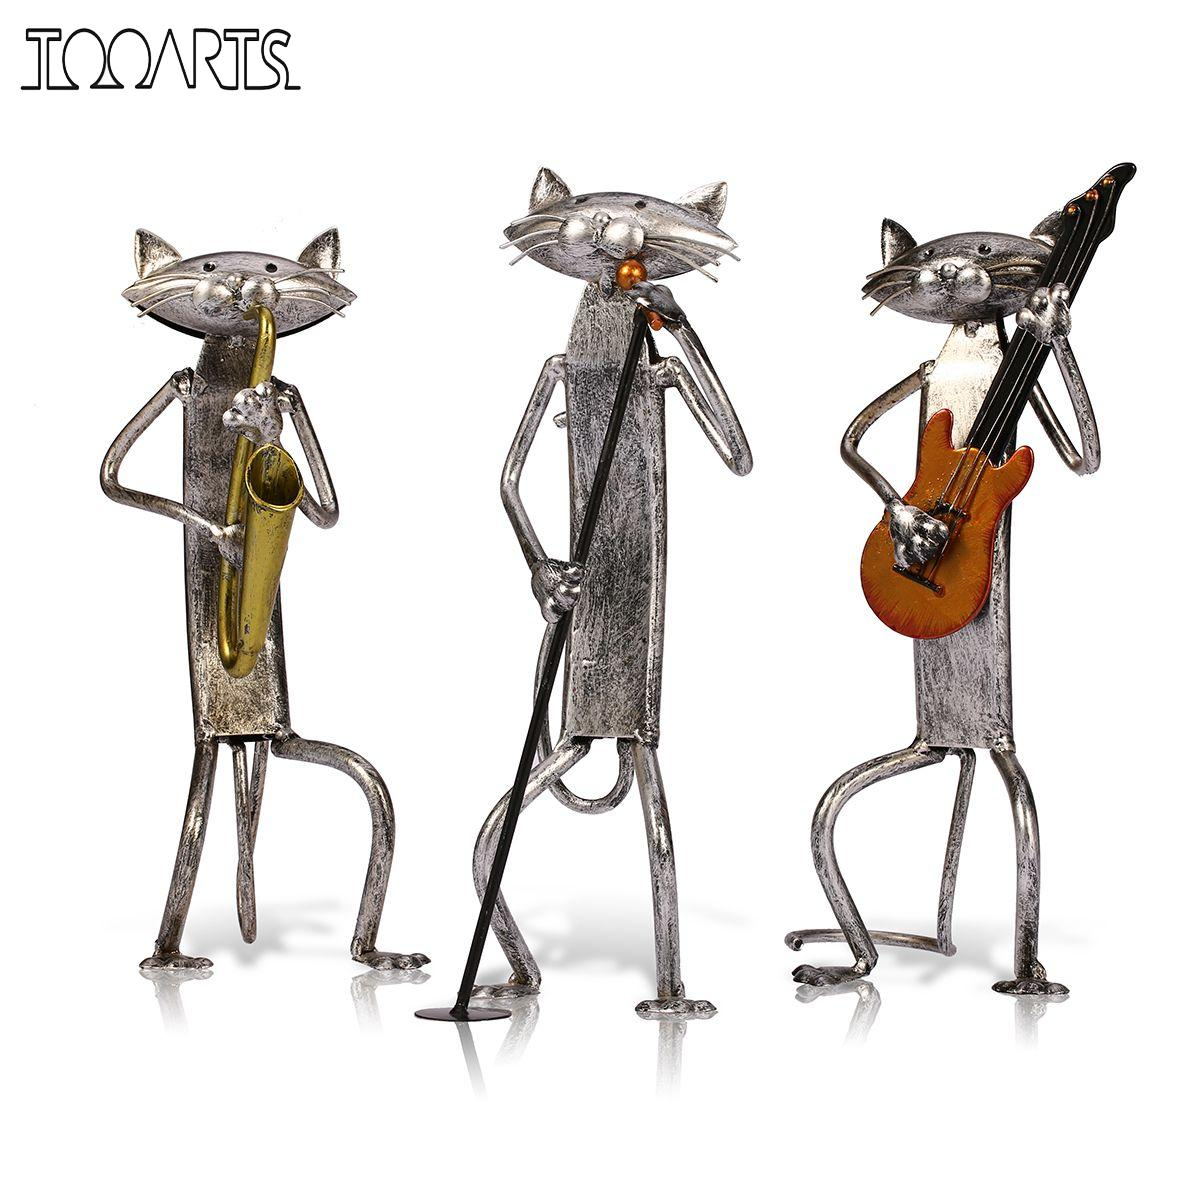 TOOARTS Orchestra Band Musician Figurines 3 Mini Cat Craft Animal Modern Sculpture Home Decoration Accessories Creative